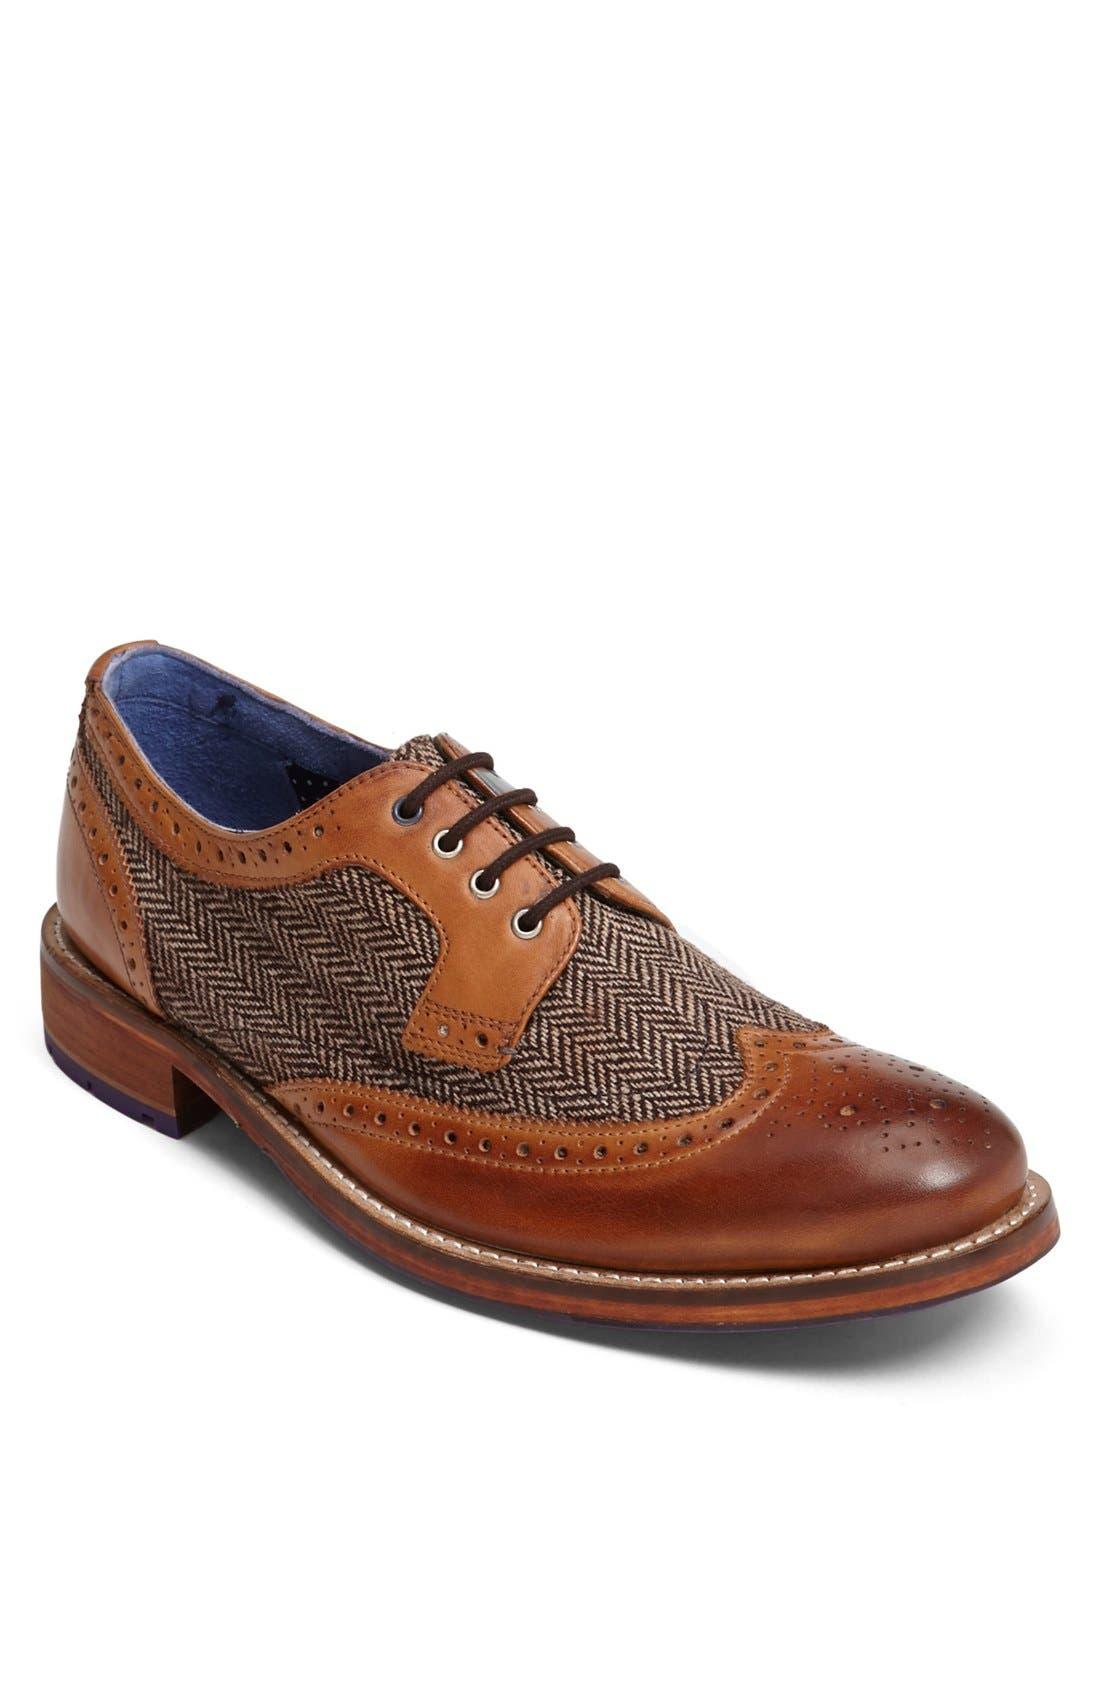 Main Image - Ted Baker London 'Cassiuss 2' Spectator Shoe